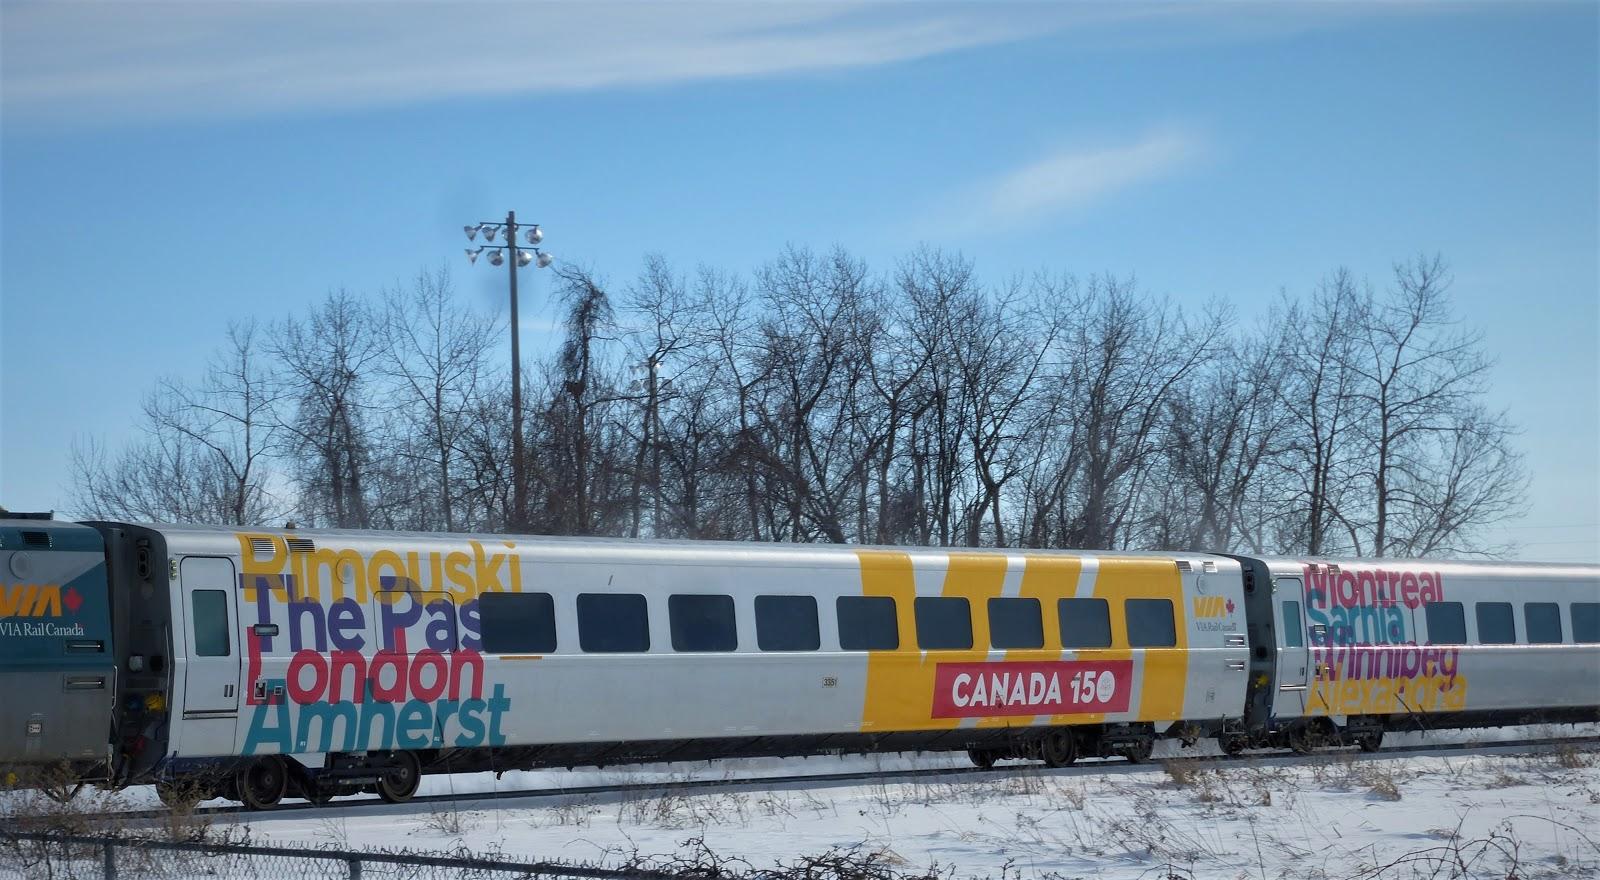 THE BEACHBURG SUB: Ten ways to revitalize Via Rail Canada (Part I)